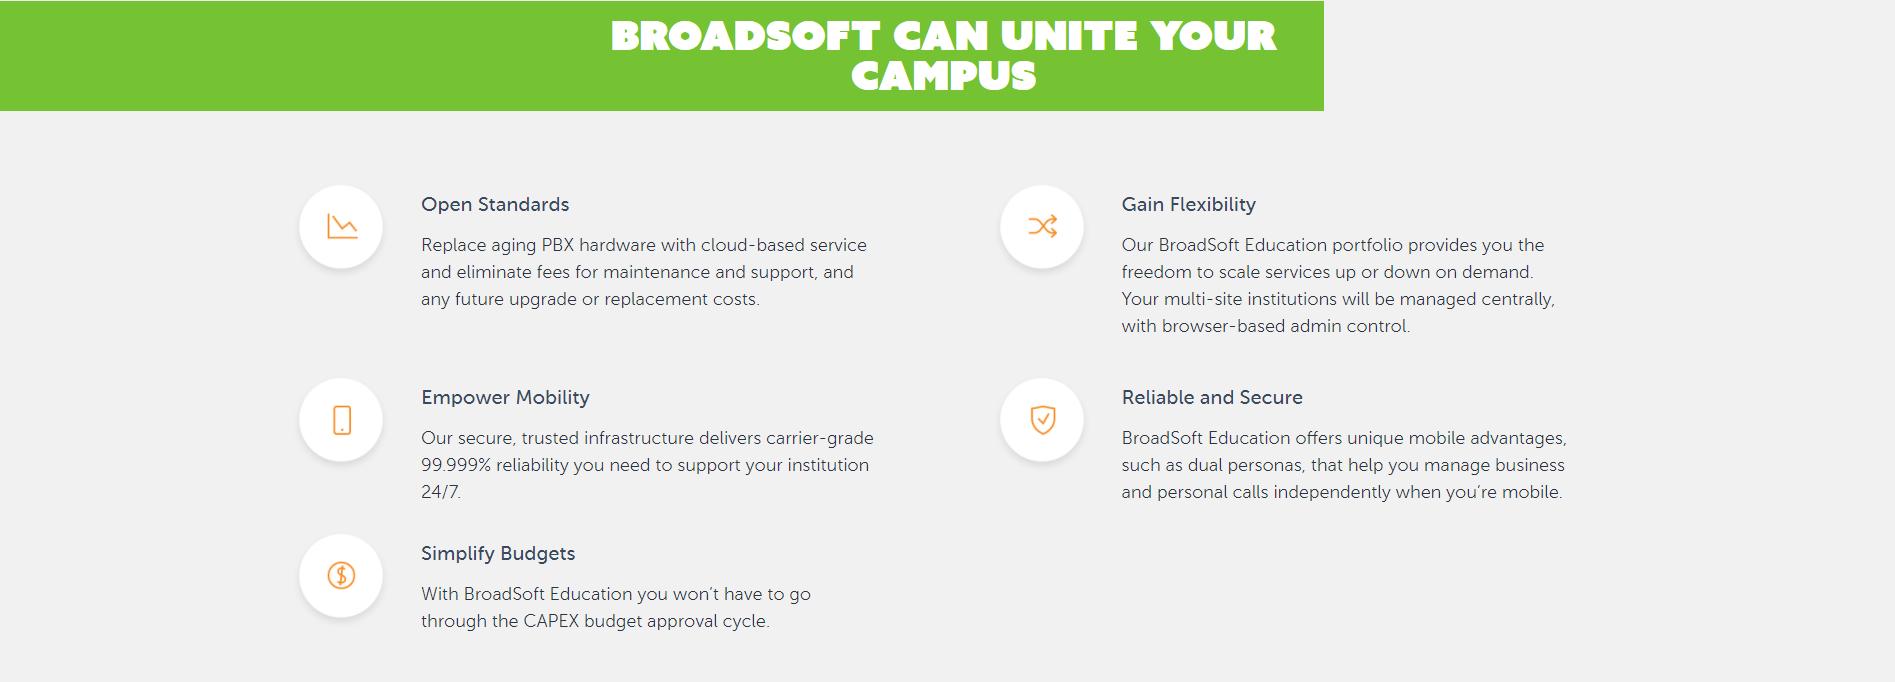 broadsoft-education-unite.png